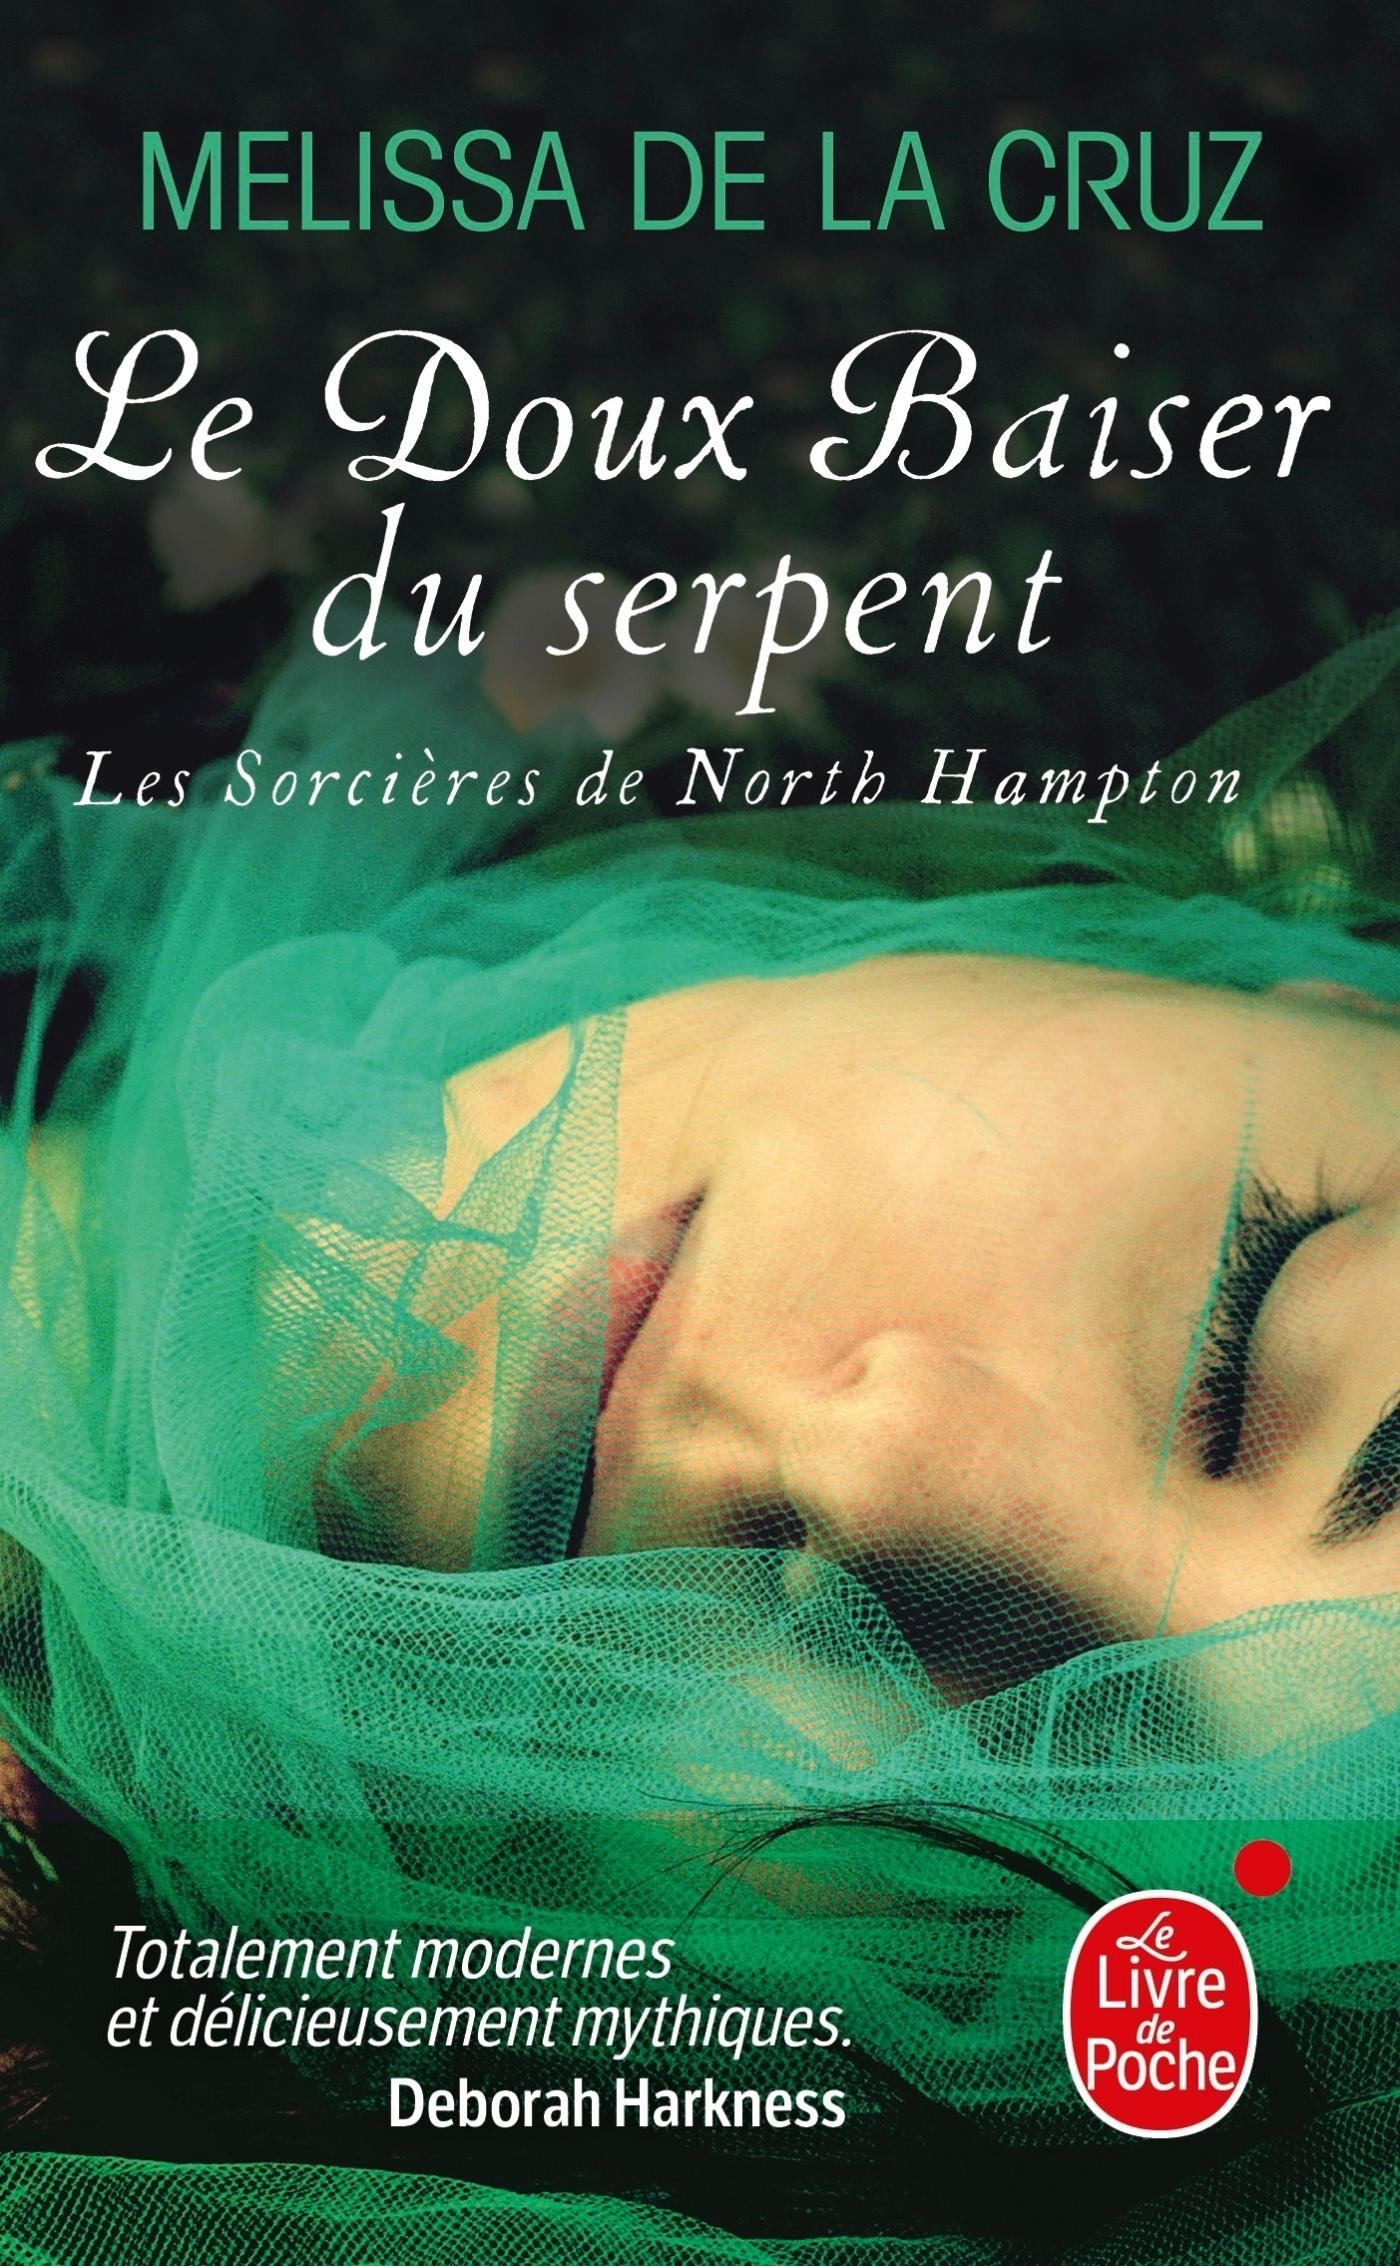 LE BAISER DU SERPENT (LES SORCIERES DE NORTH HAMPTON, TOME 2)